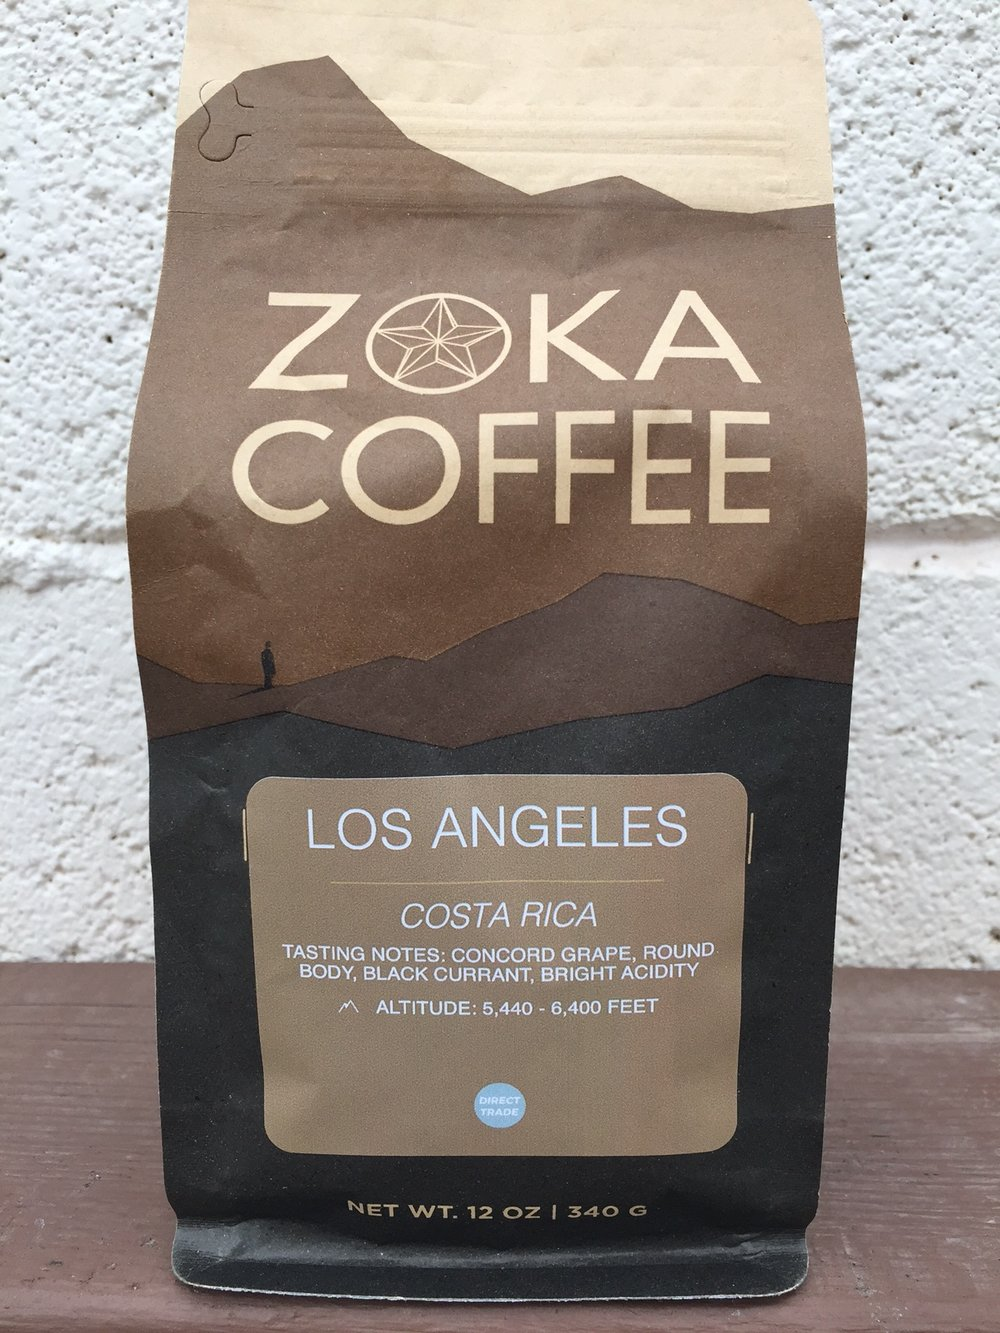 Zoka Coffee Costa Rica